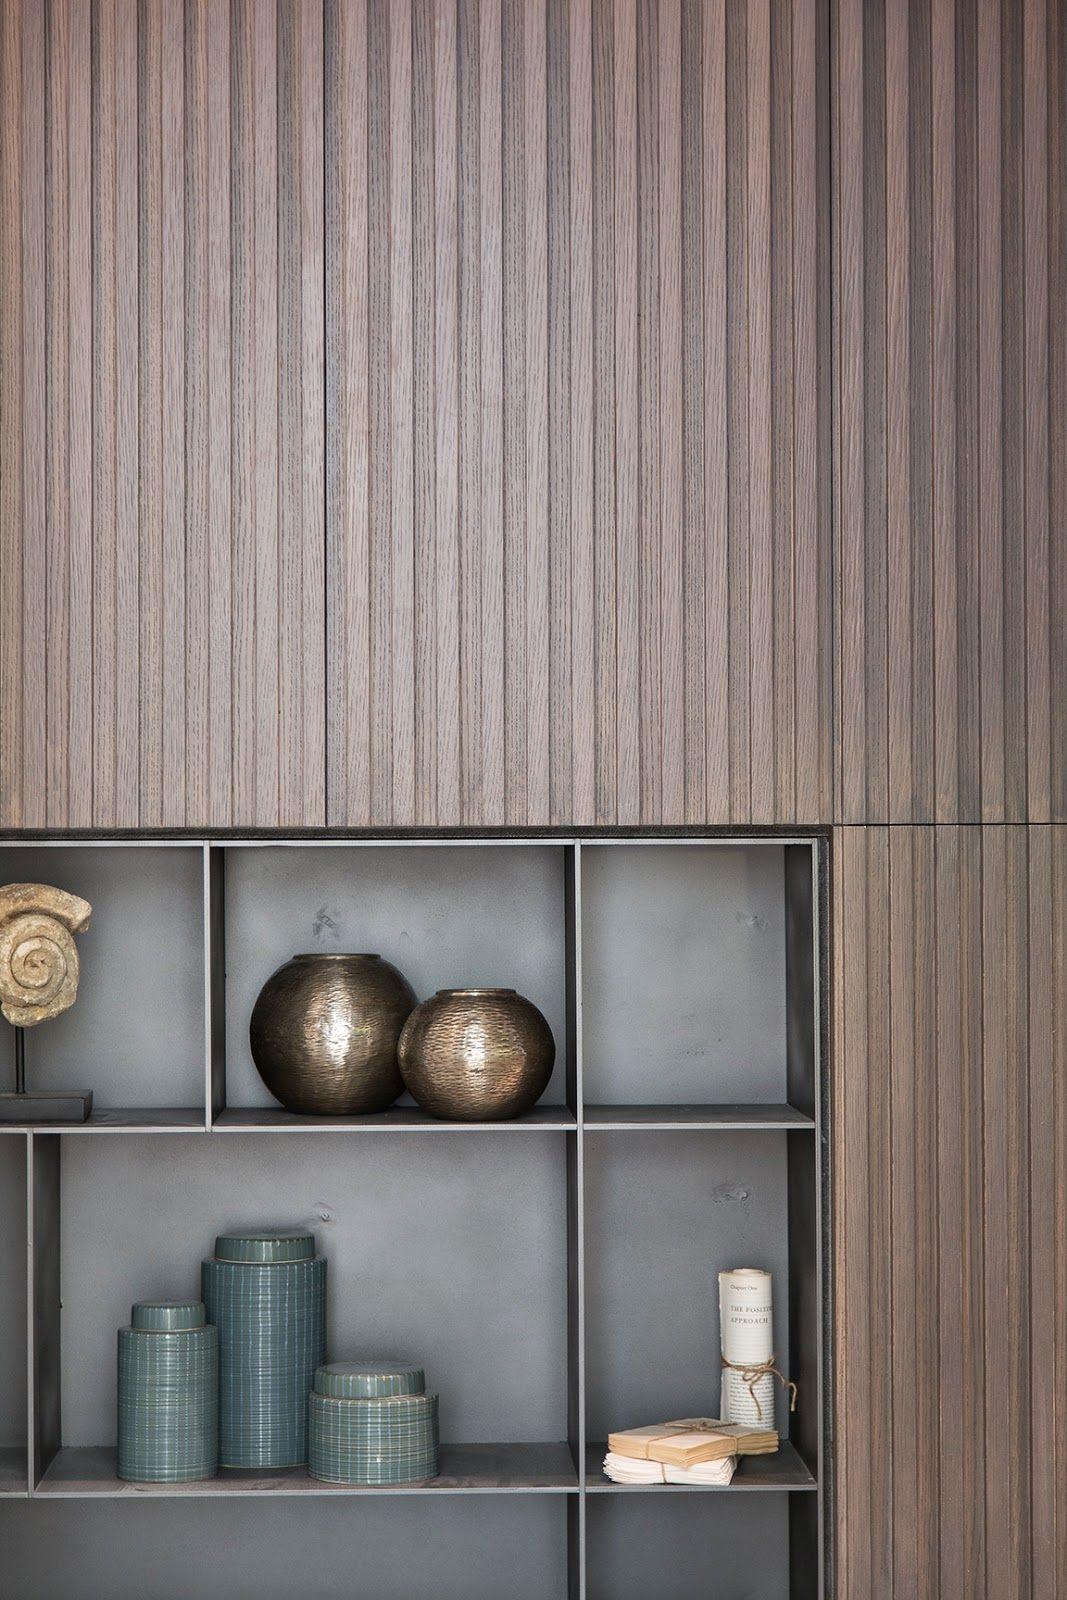 interior design blog lli design london r e t a i l. Black Bedroom Furniture Sets. Home Design Ideas